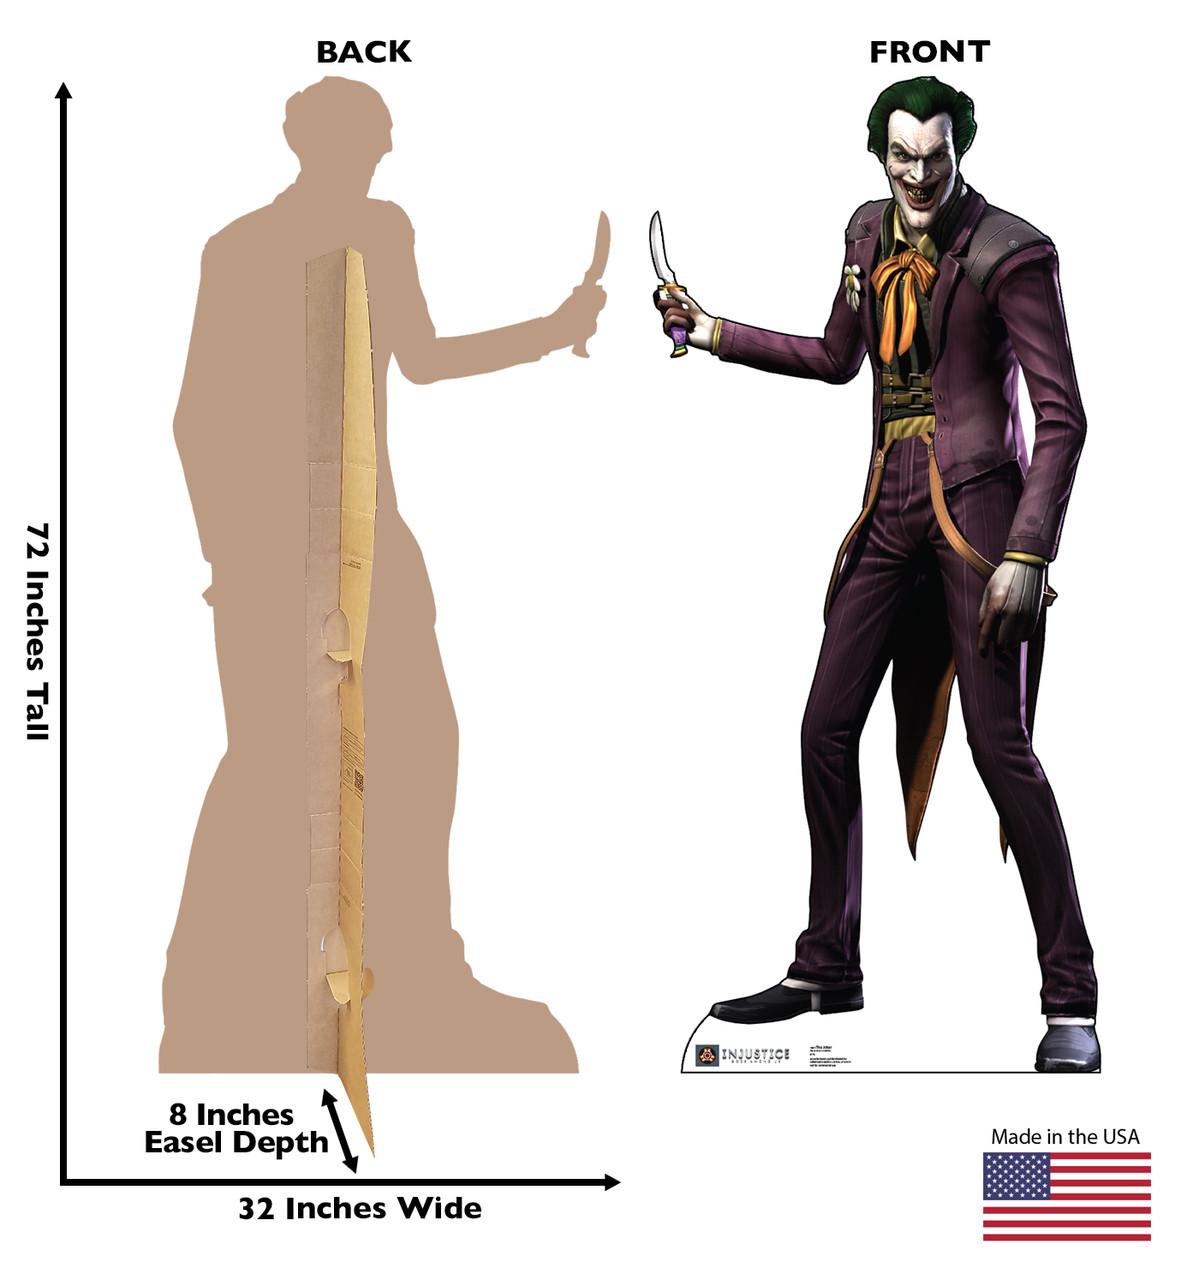 The Joker - Injustice Gods Among Us - Cardboard Cutout